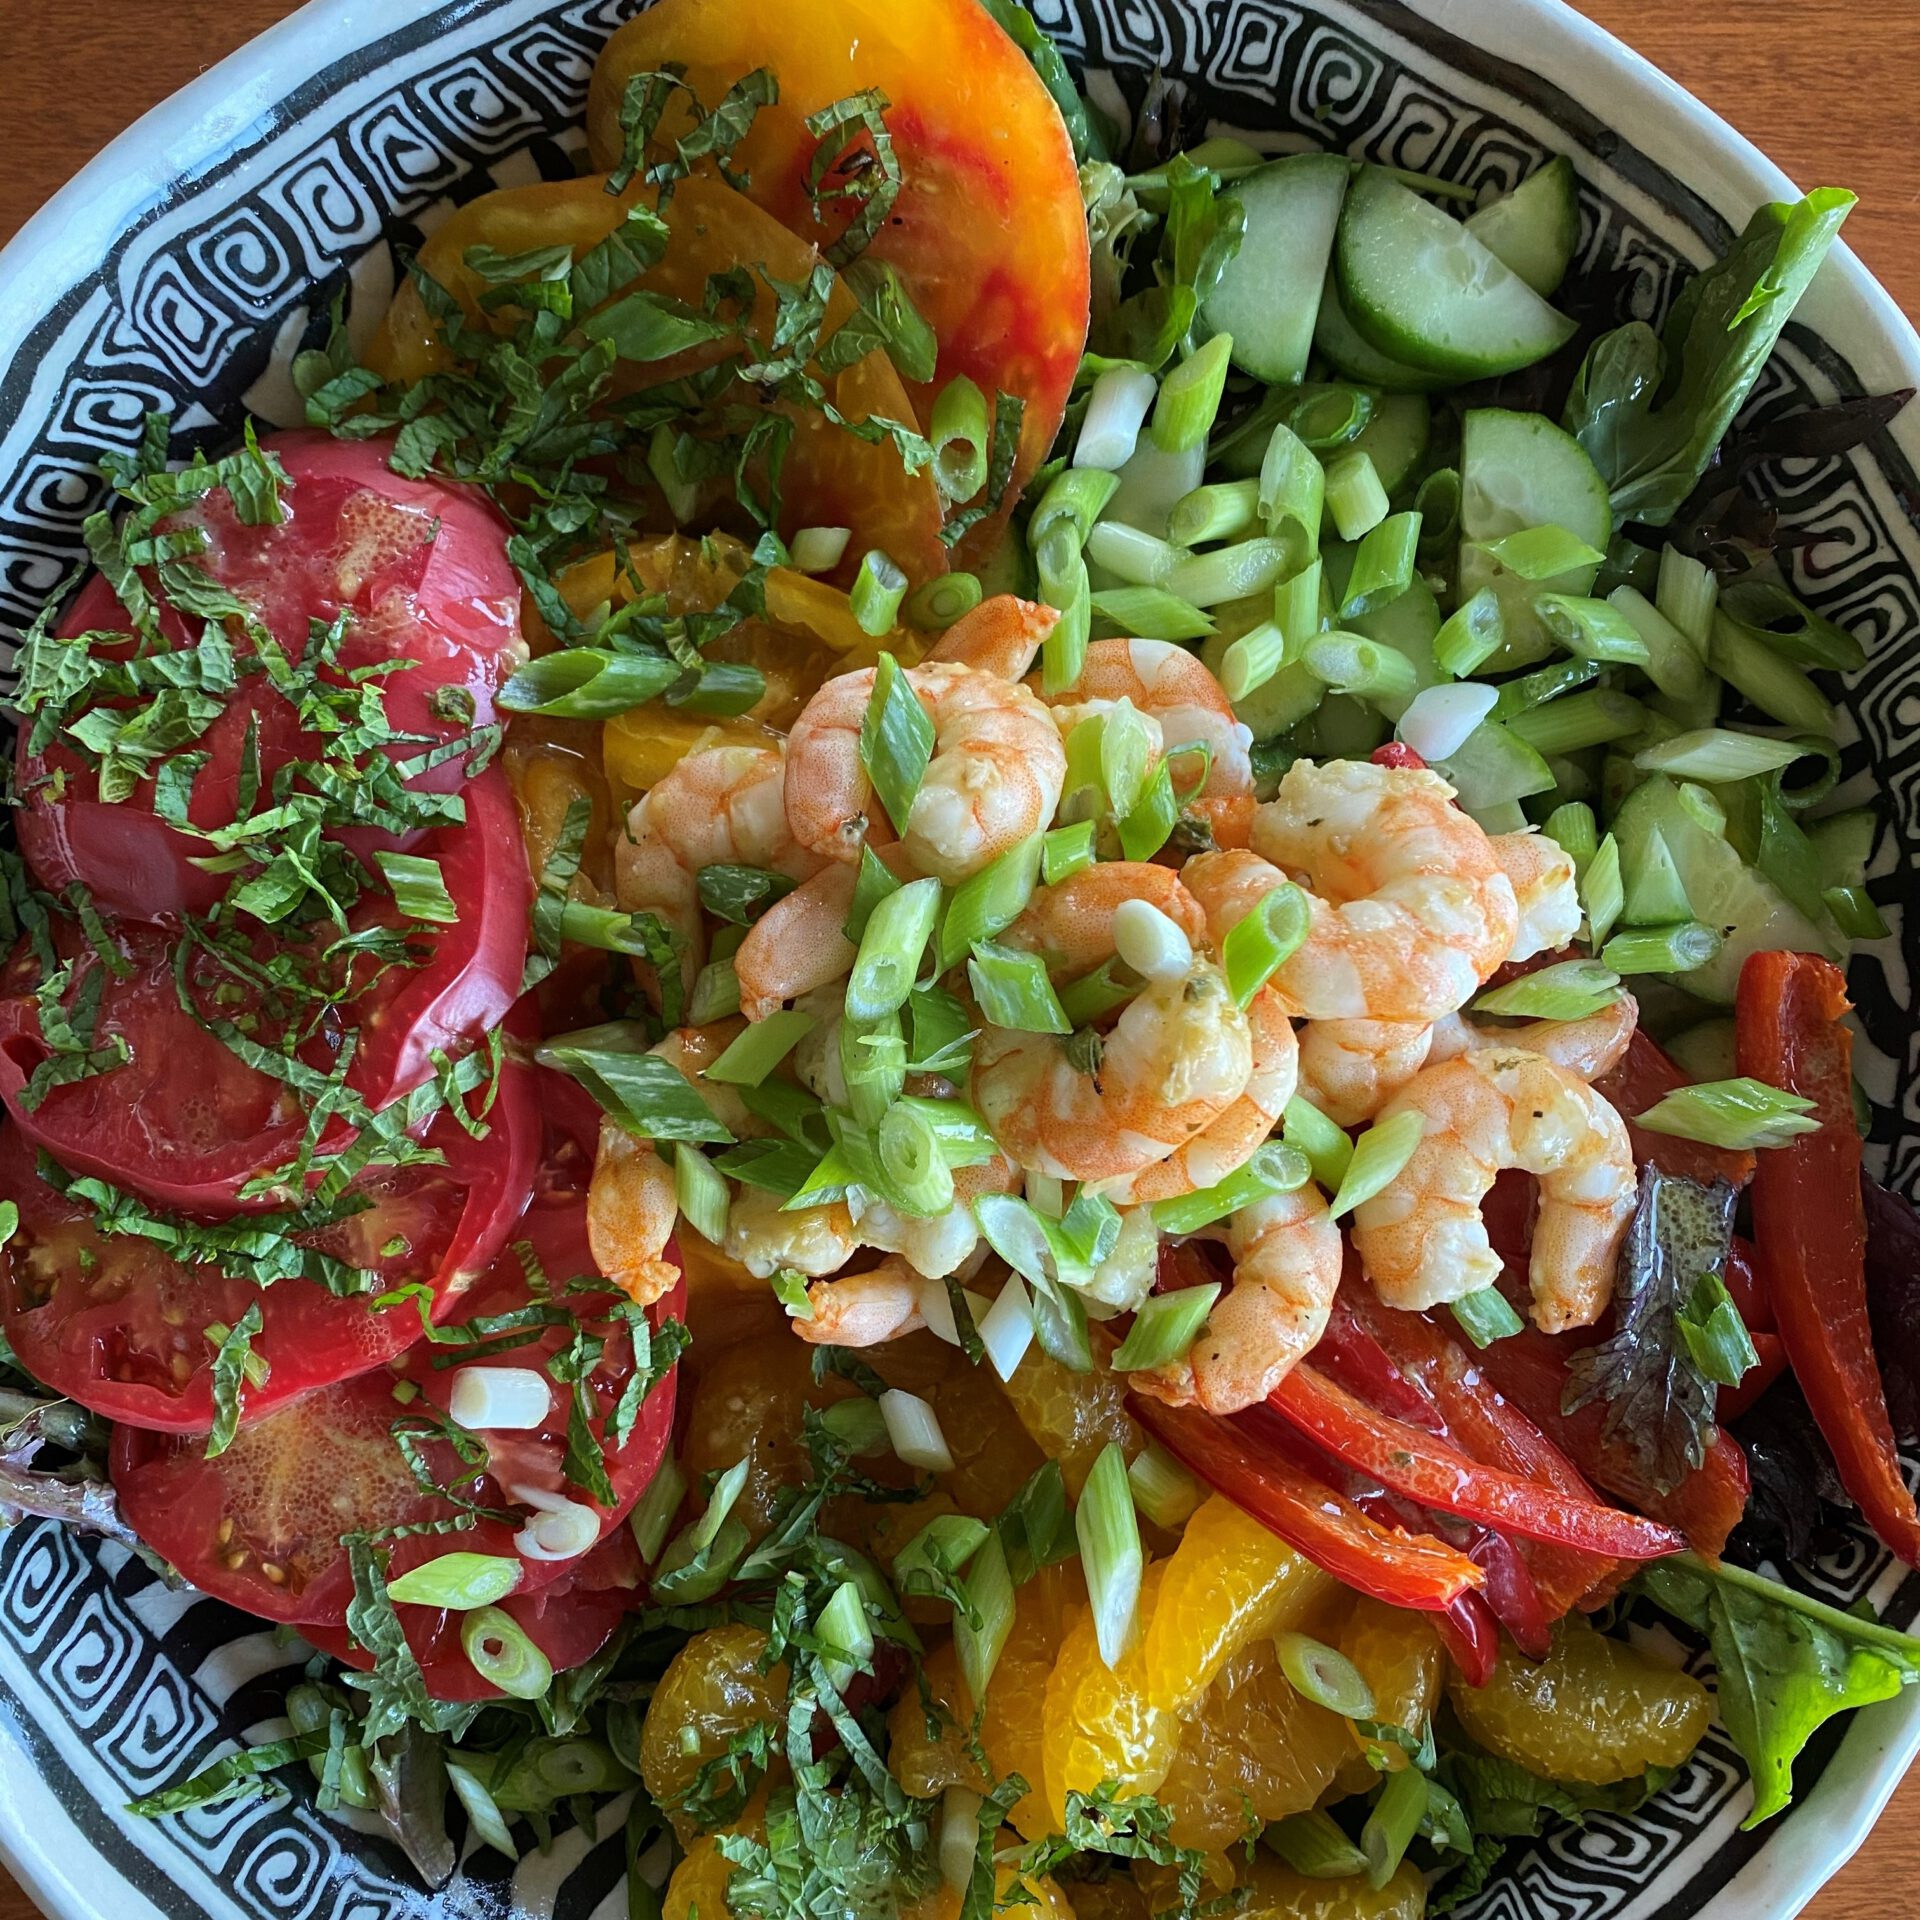 lettuce salad with vegetables and shrimp in bowl